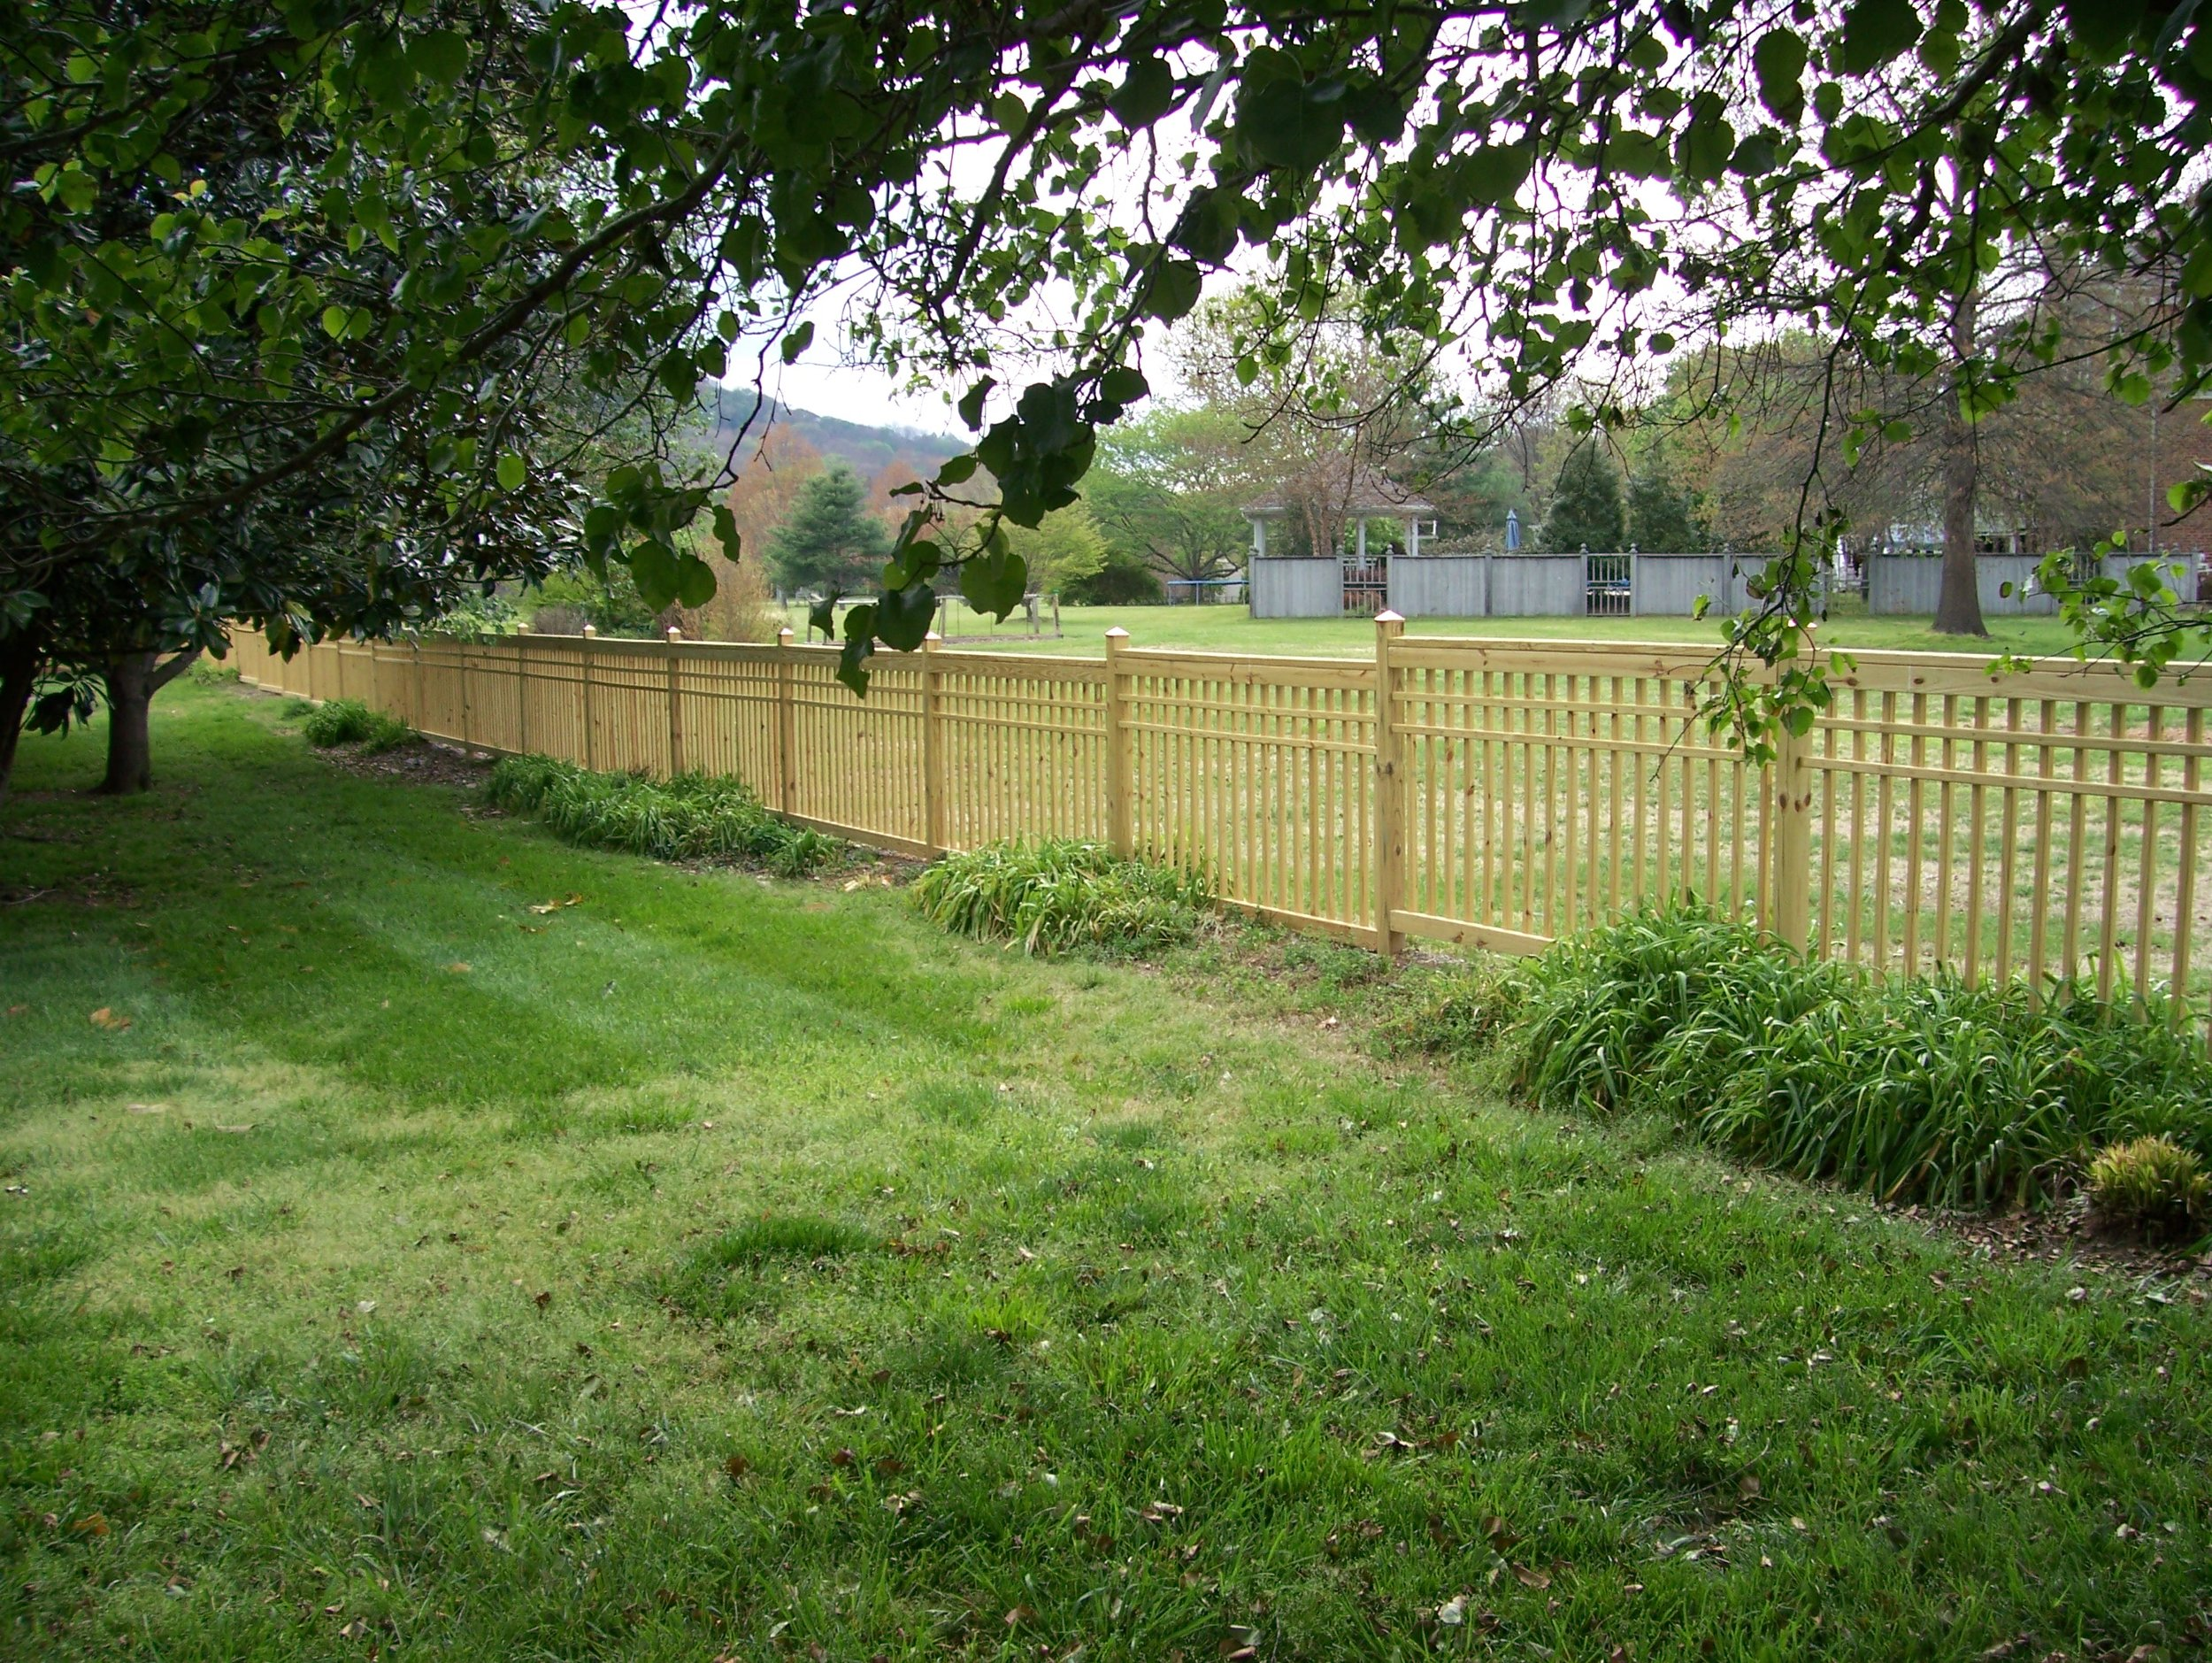 fence_015.jpg